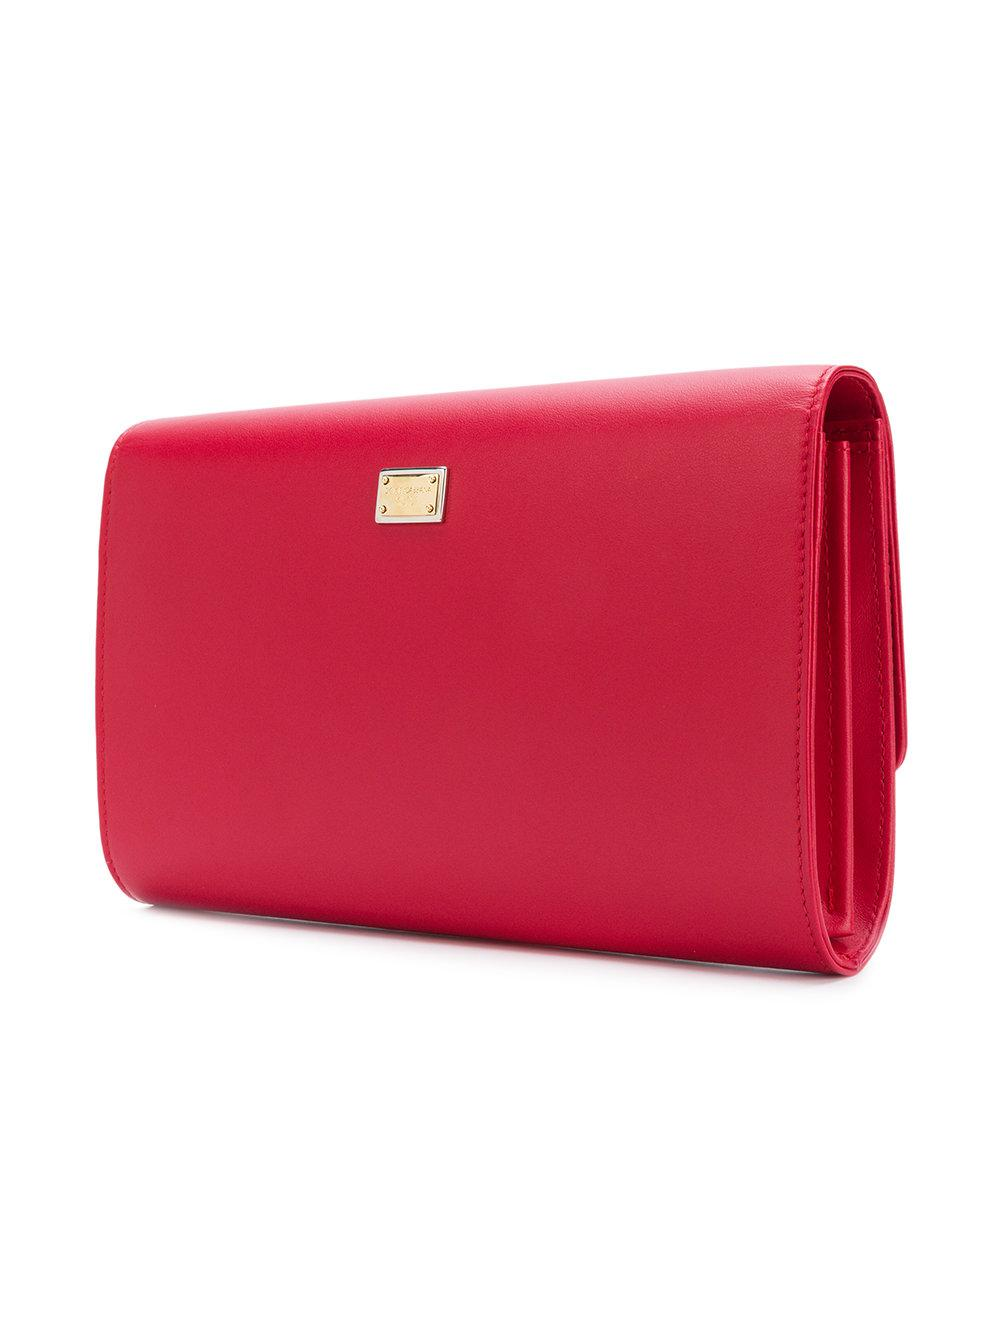 LAmour clutch bag - Red Dolce & Gabbana 2Xg5hEBi